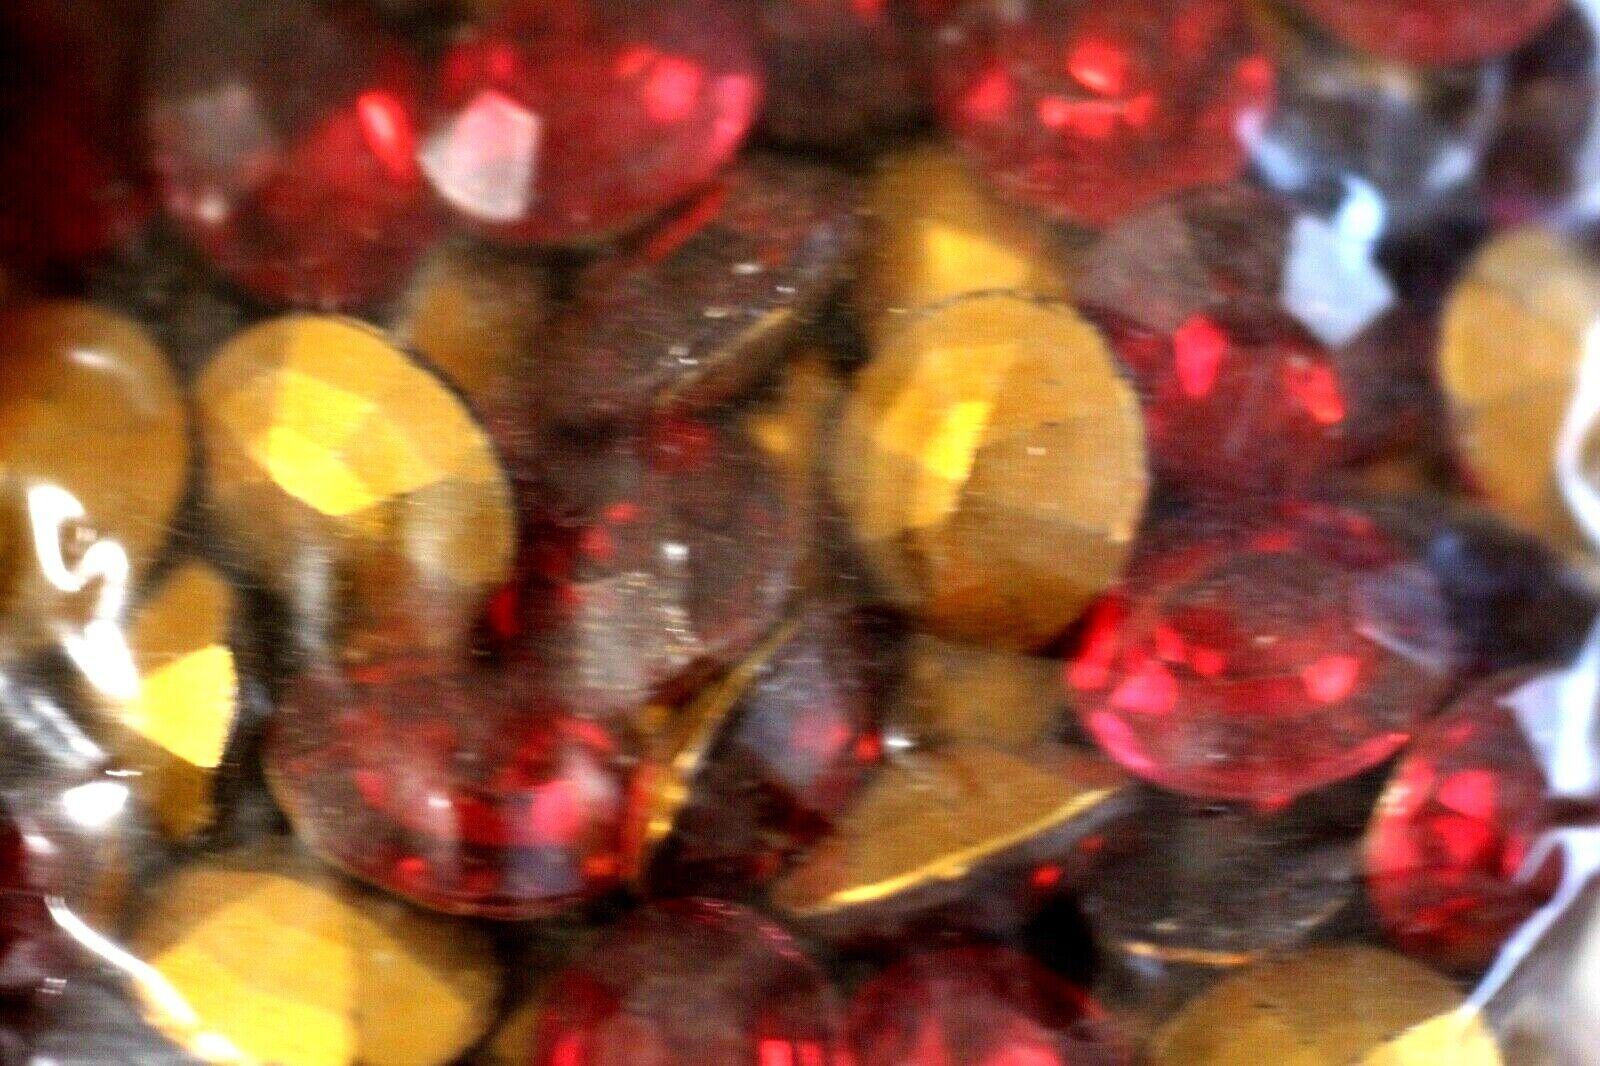 858 12X10MM OVAL GLASS RED RHINESTONES 12PC - $2.95